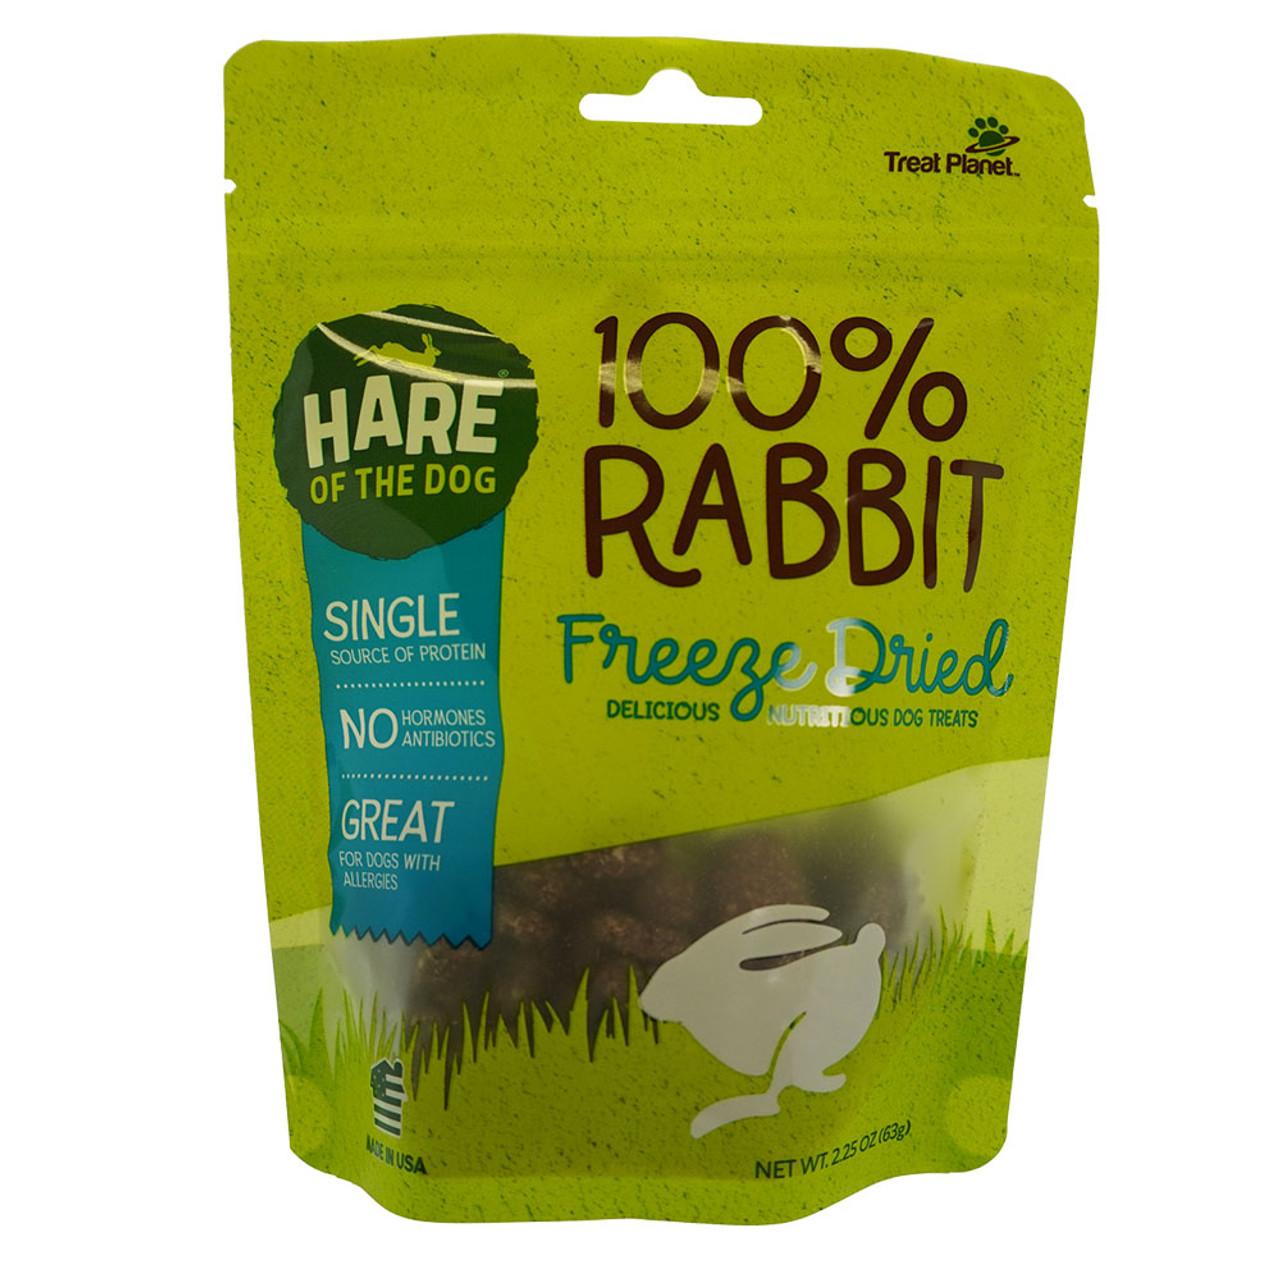 Hare of the Dog 100% Rabbit Freeze Dried Dog Treats